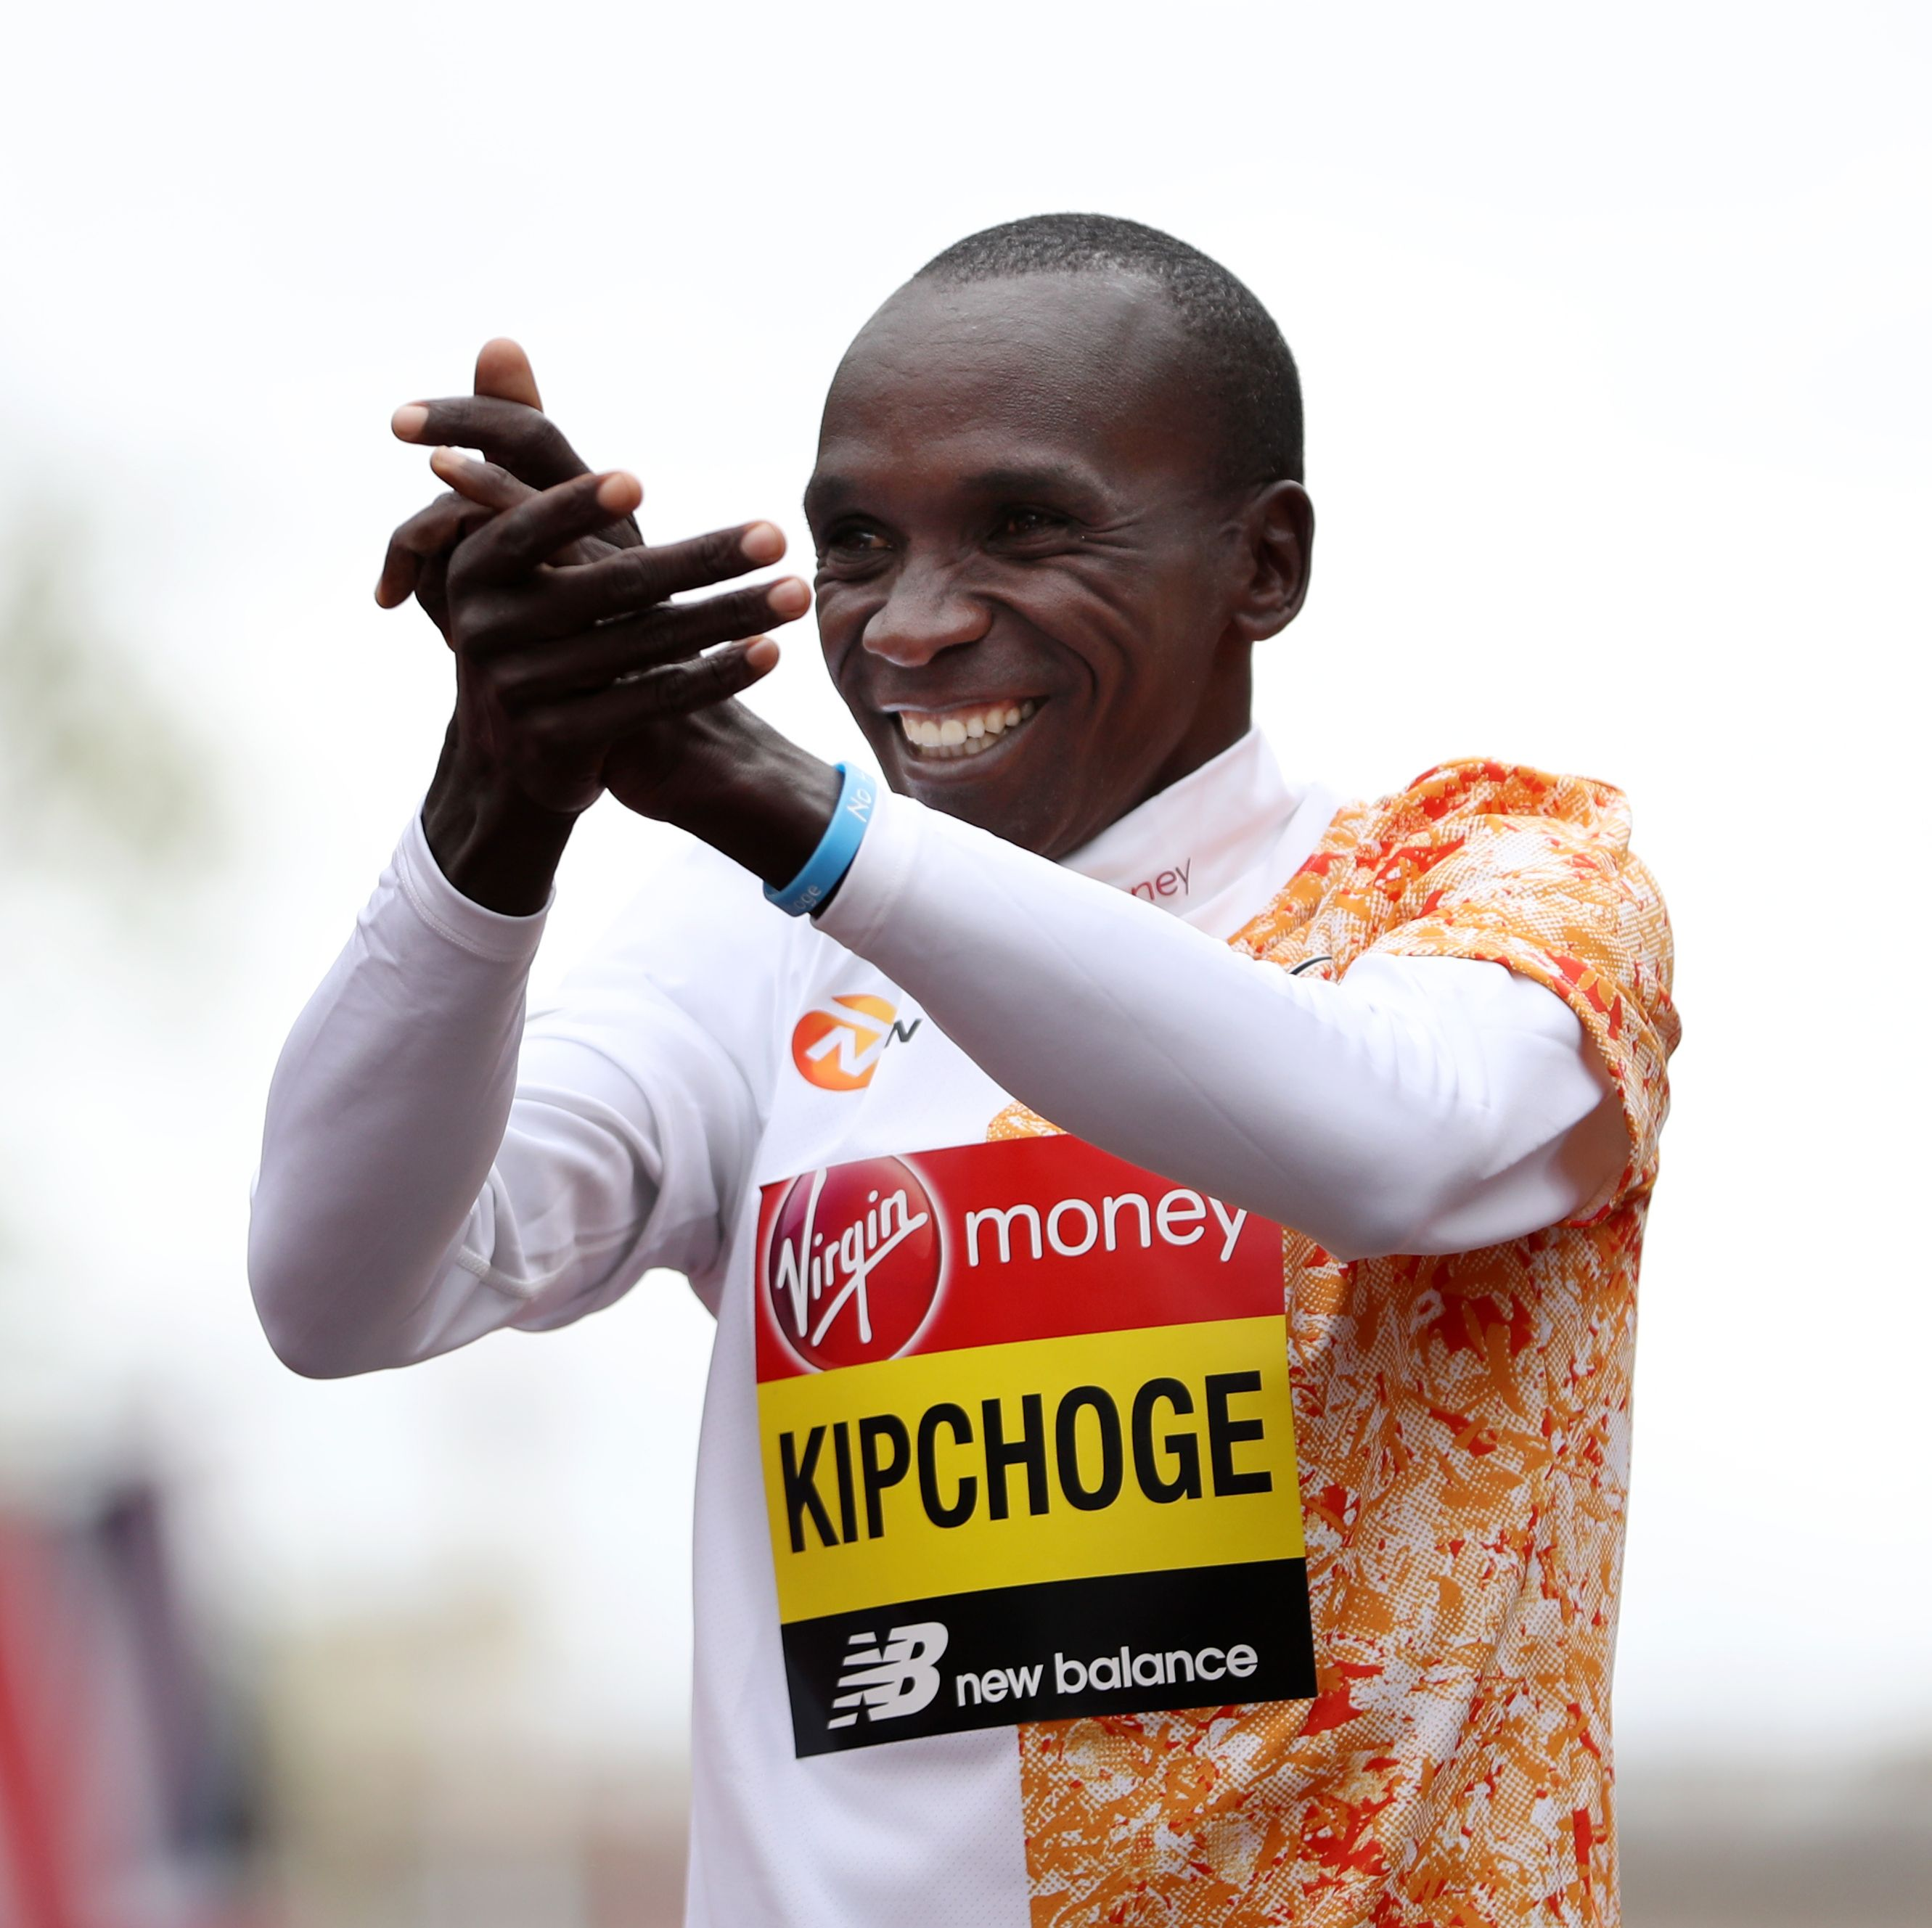 Kipchoge plans to go sub-2:00 in the marathon